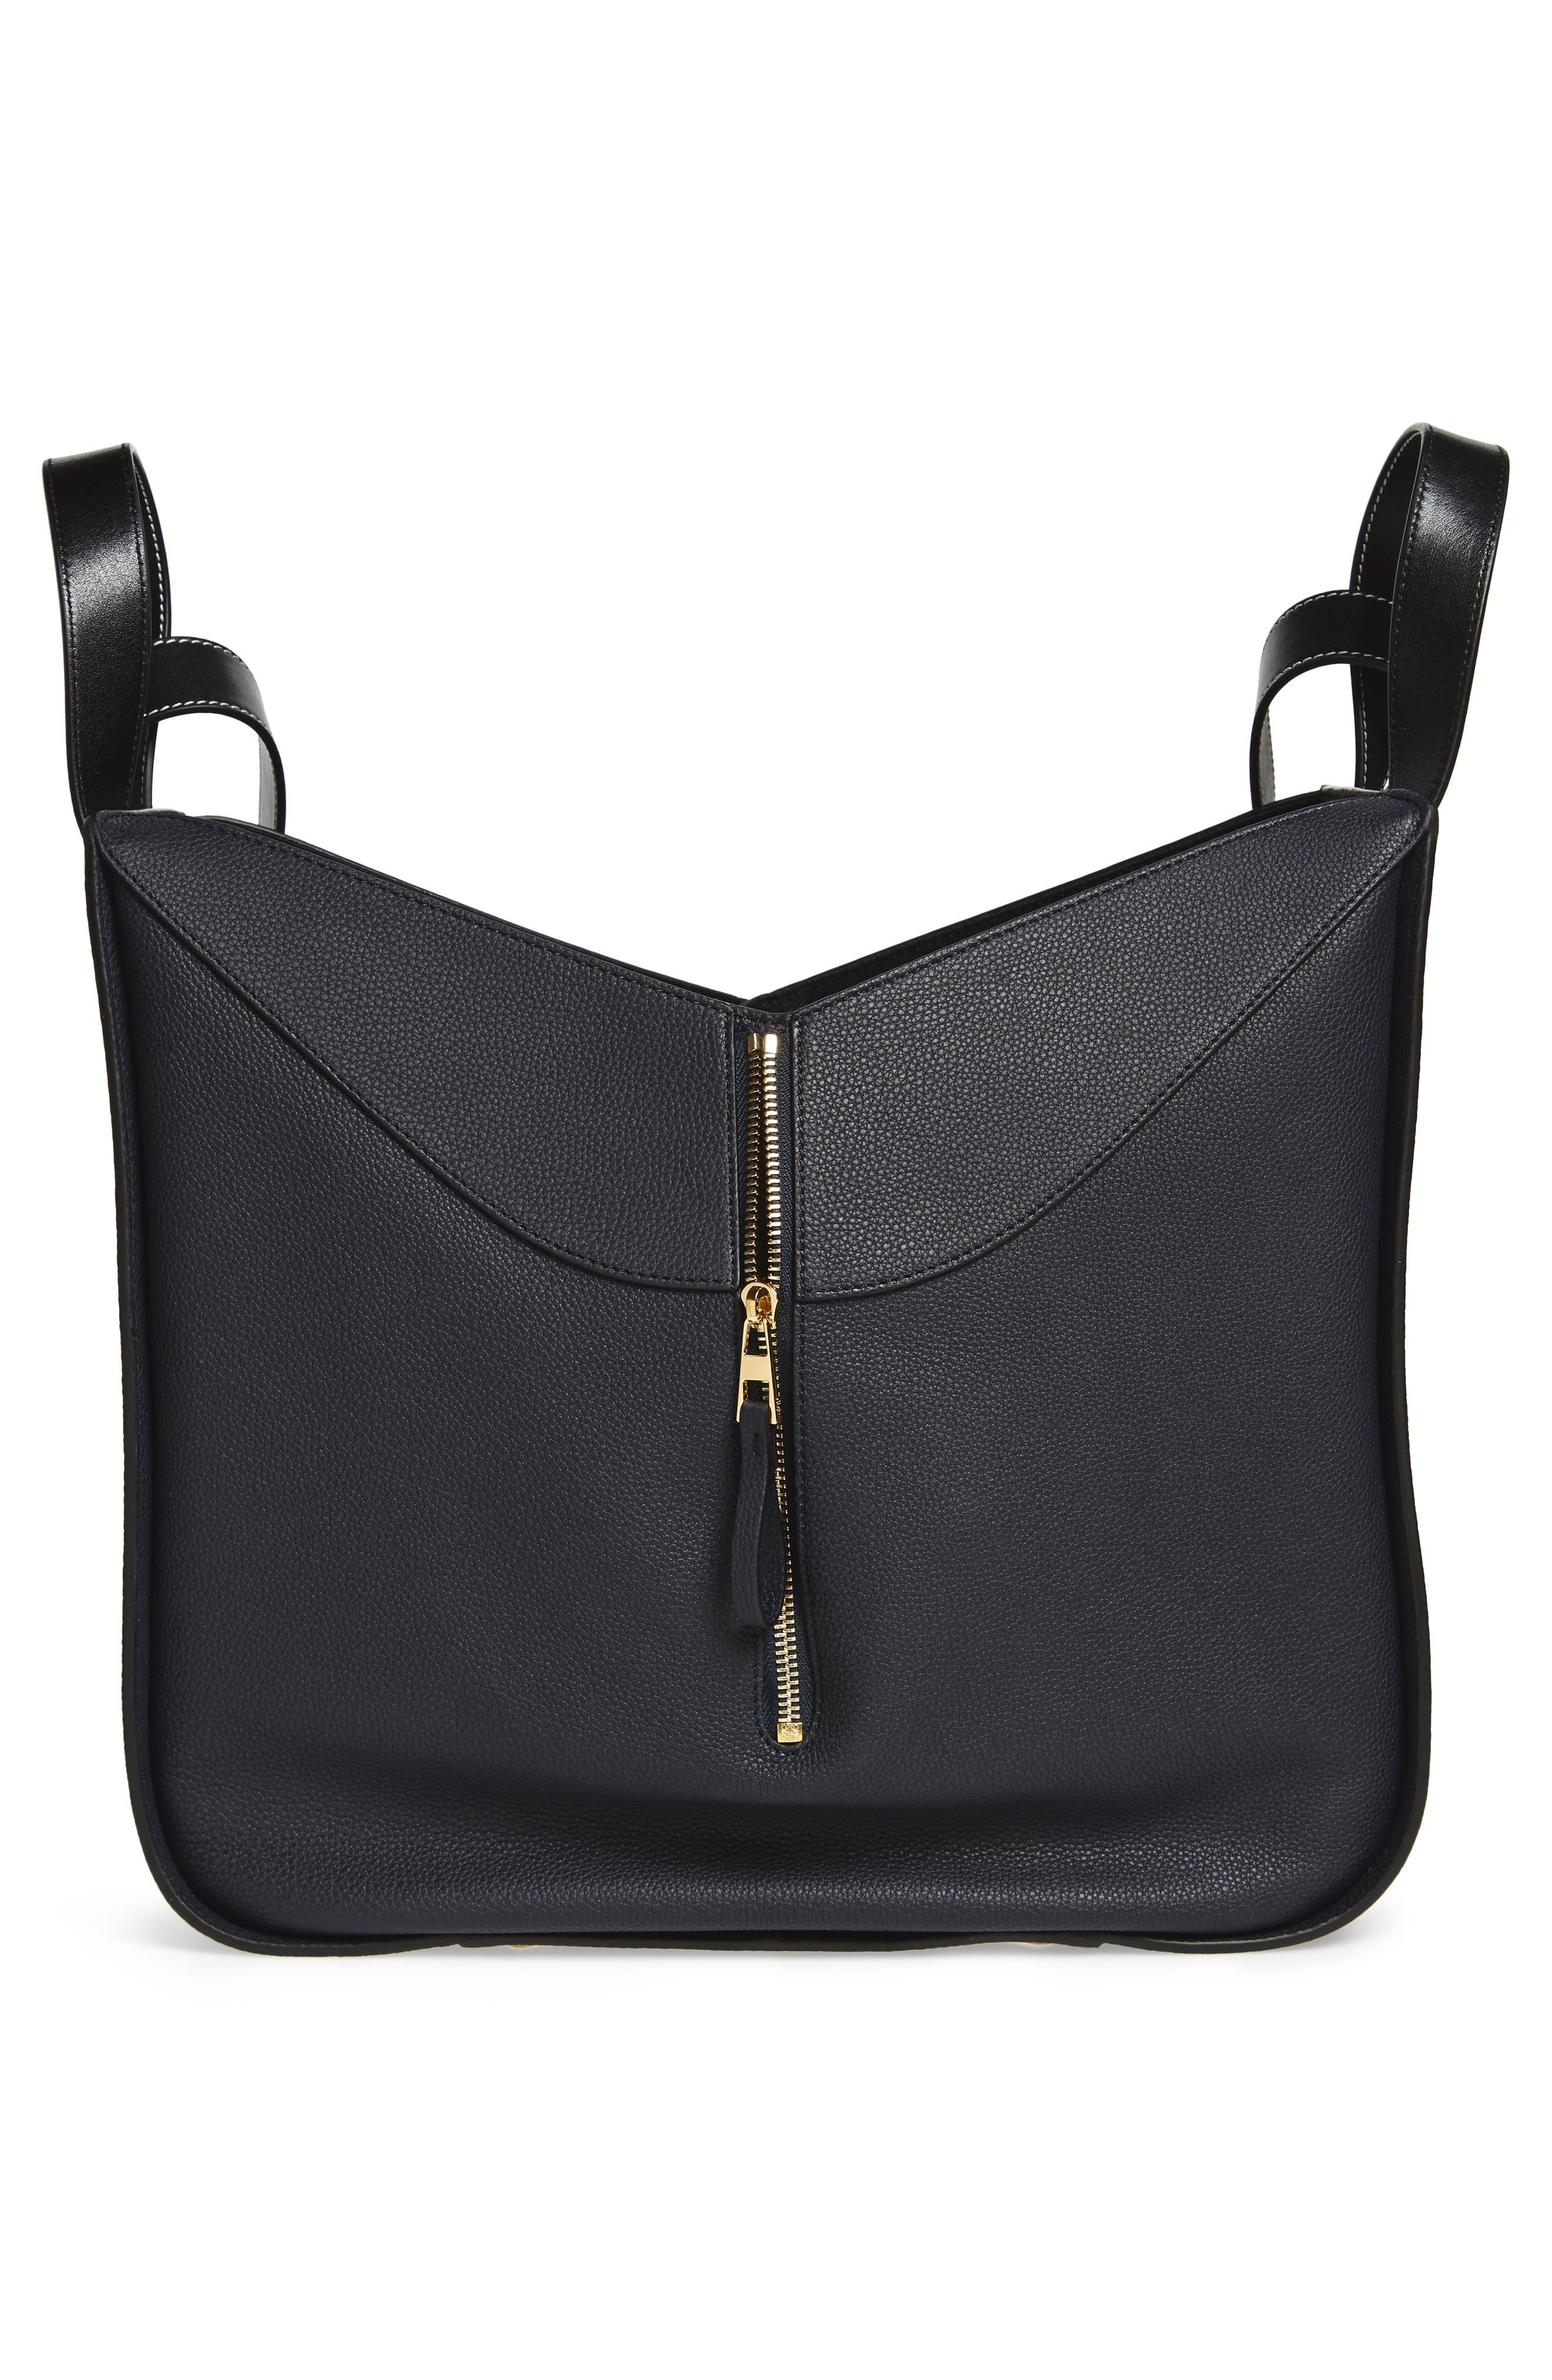 Alternate Image 3  - Loewe Medium Hammock Calfskin Leather Shoulder Bag